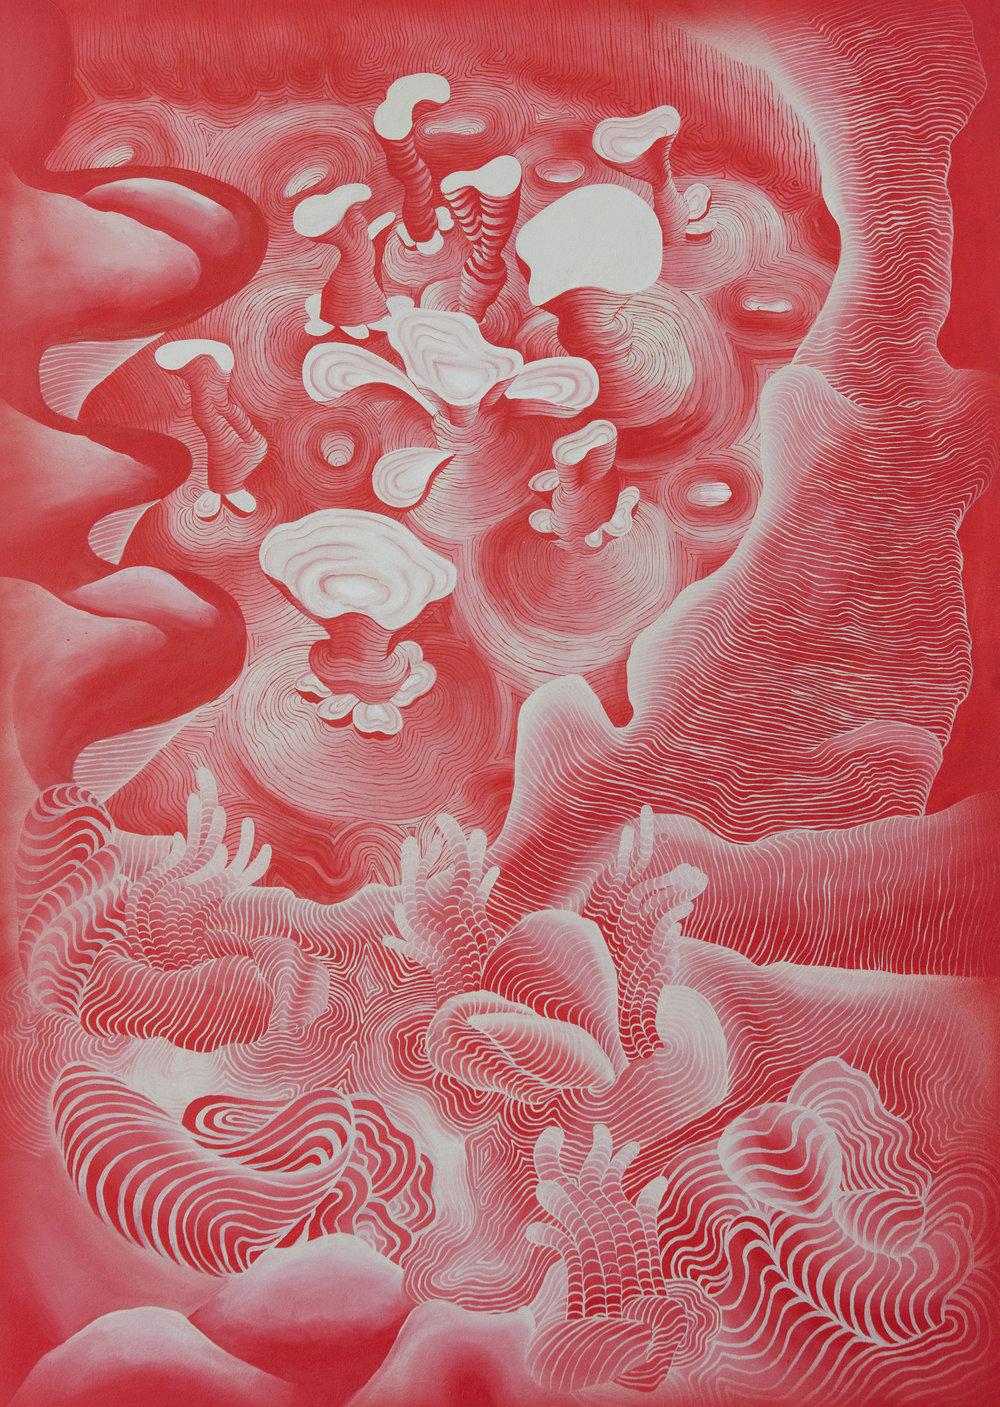 Oceano (solaris)    acrílico sobre lienzo    150 x 100 cm